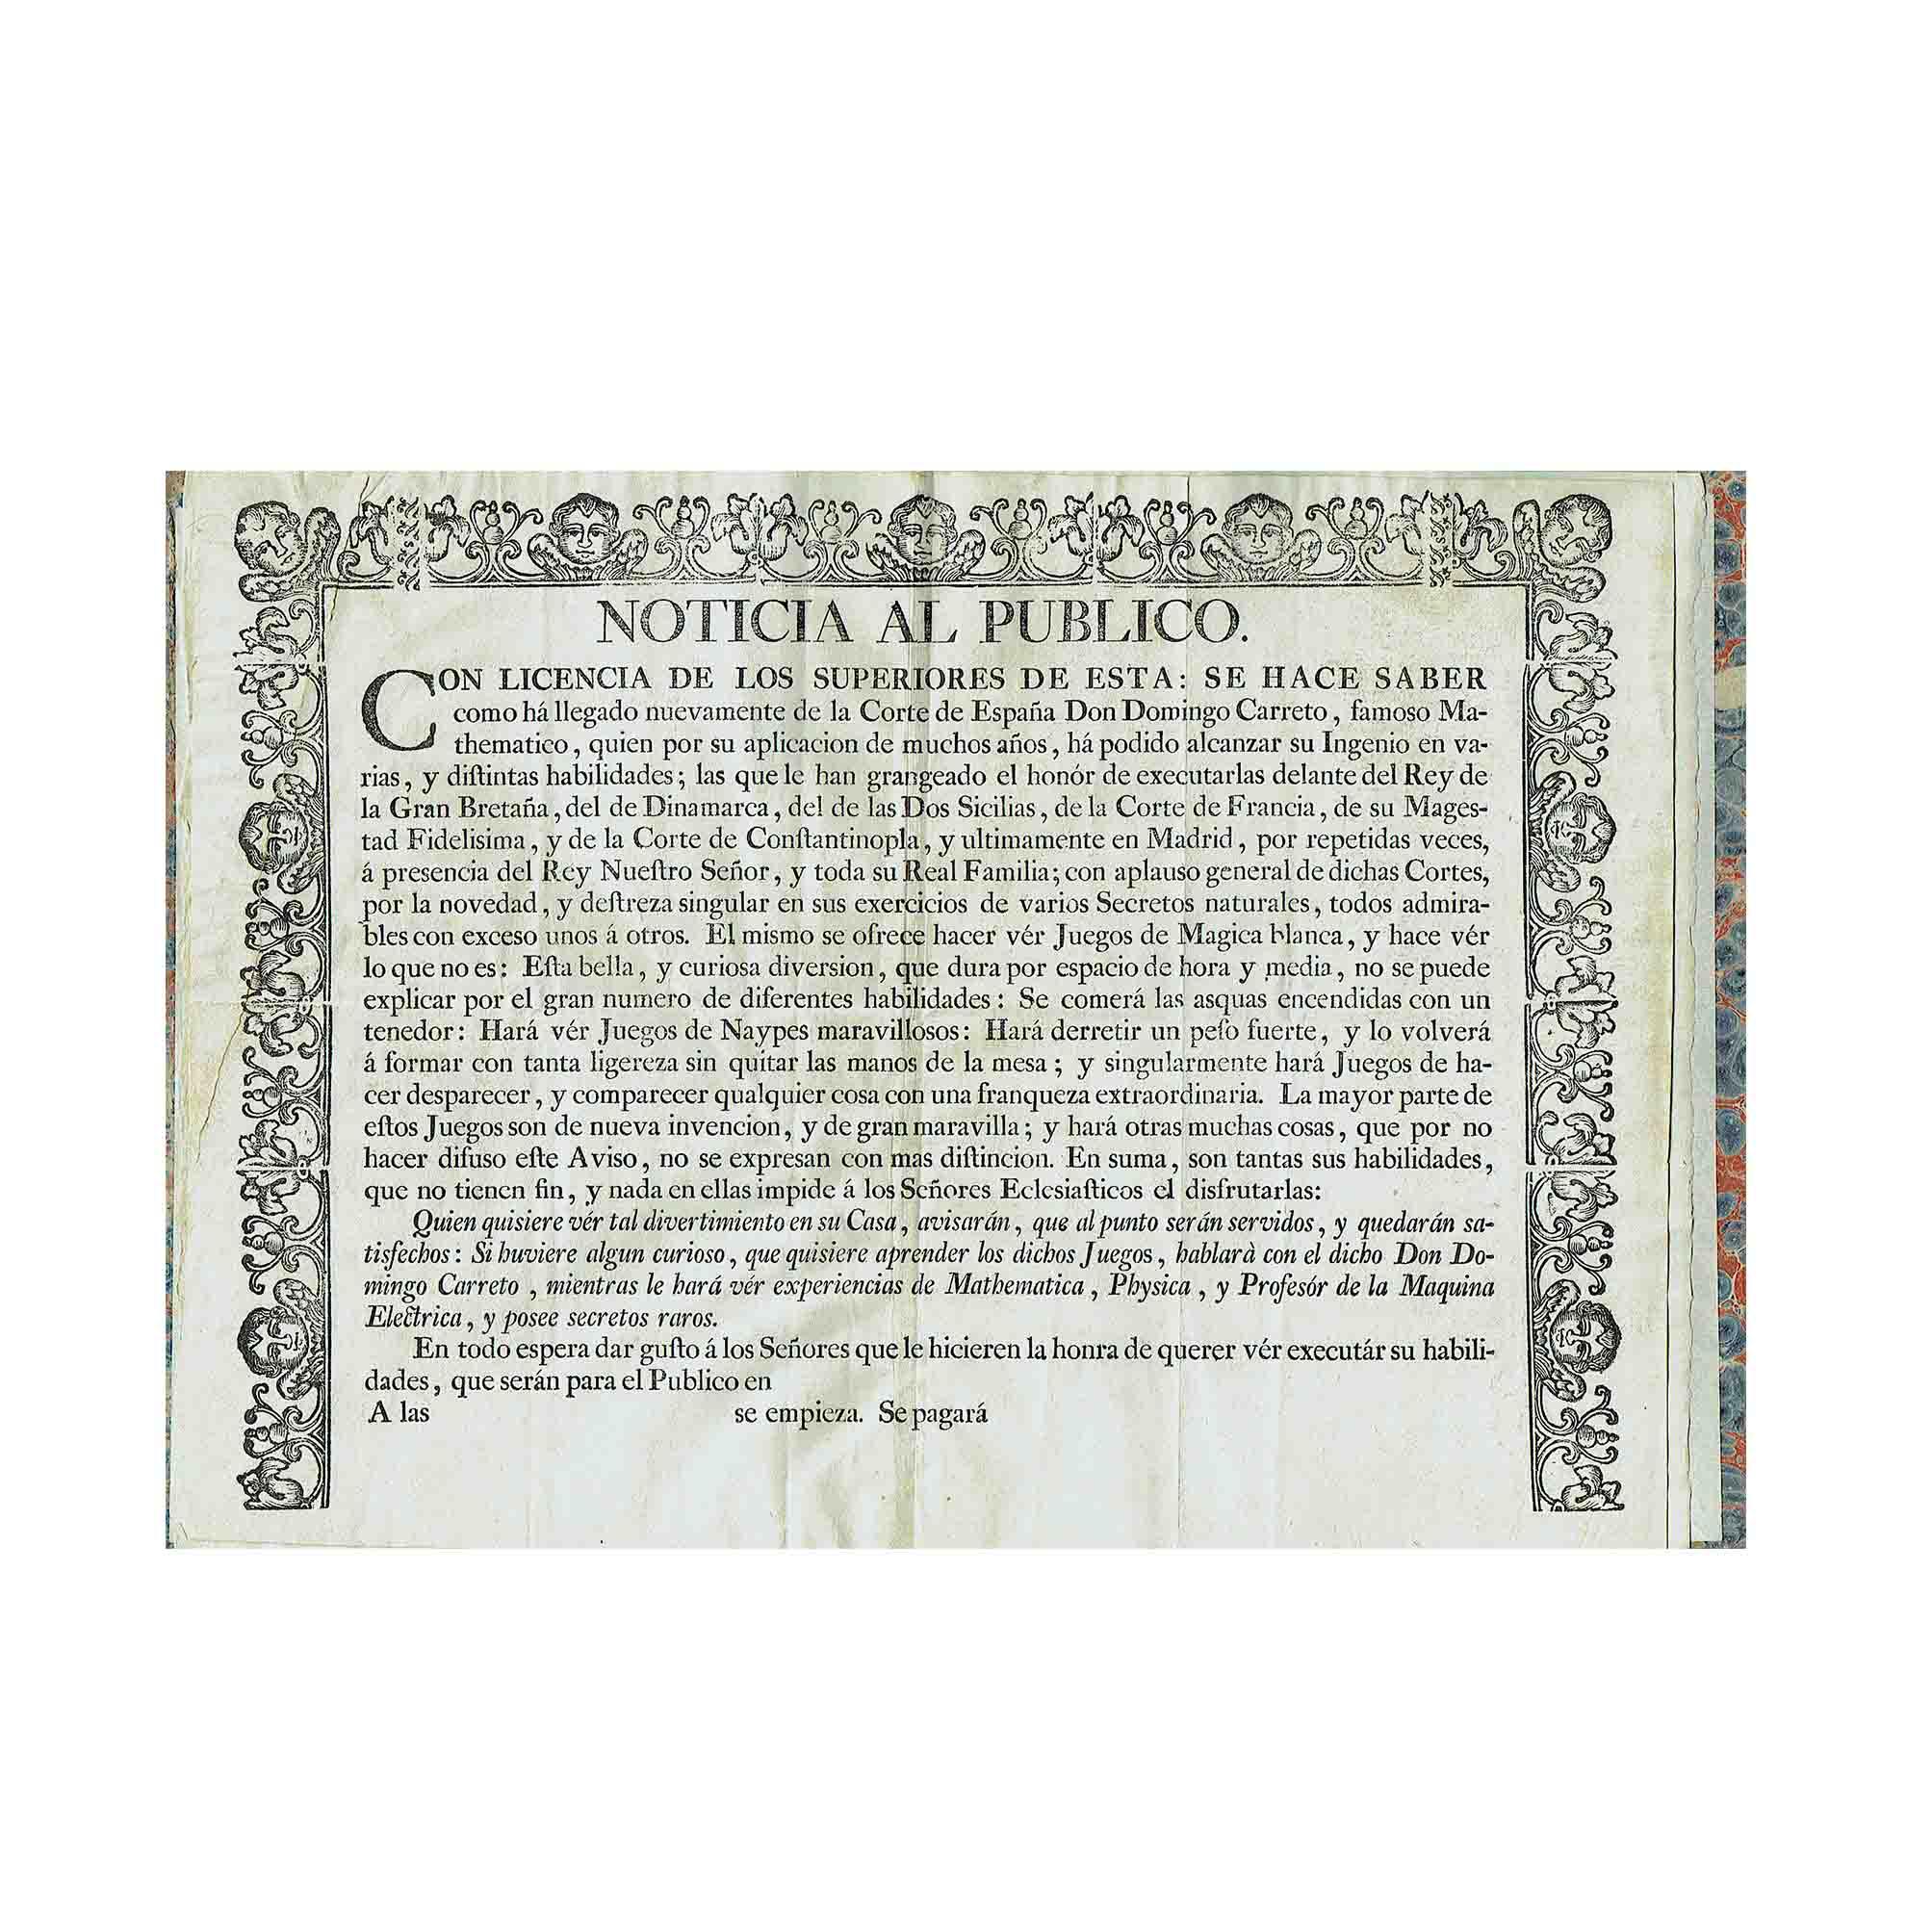 5594-Carreto-Noticia-Poster-White-Magic-1700-N.jpeg